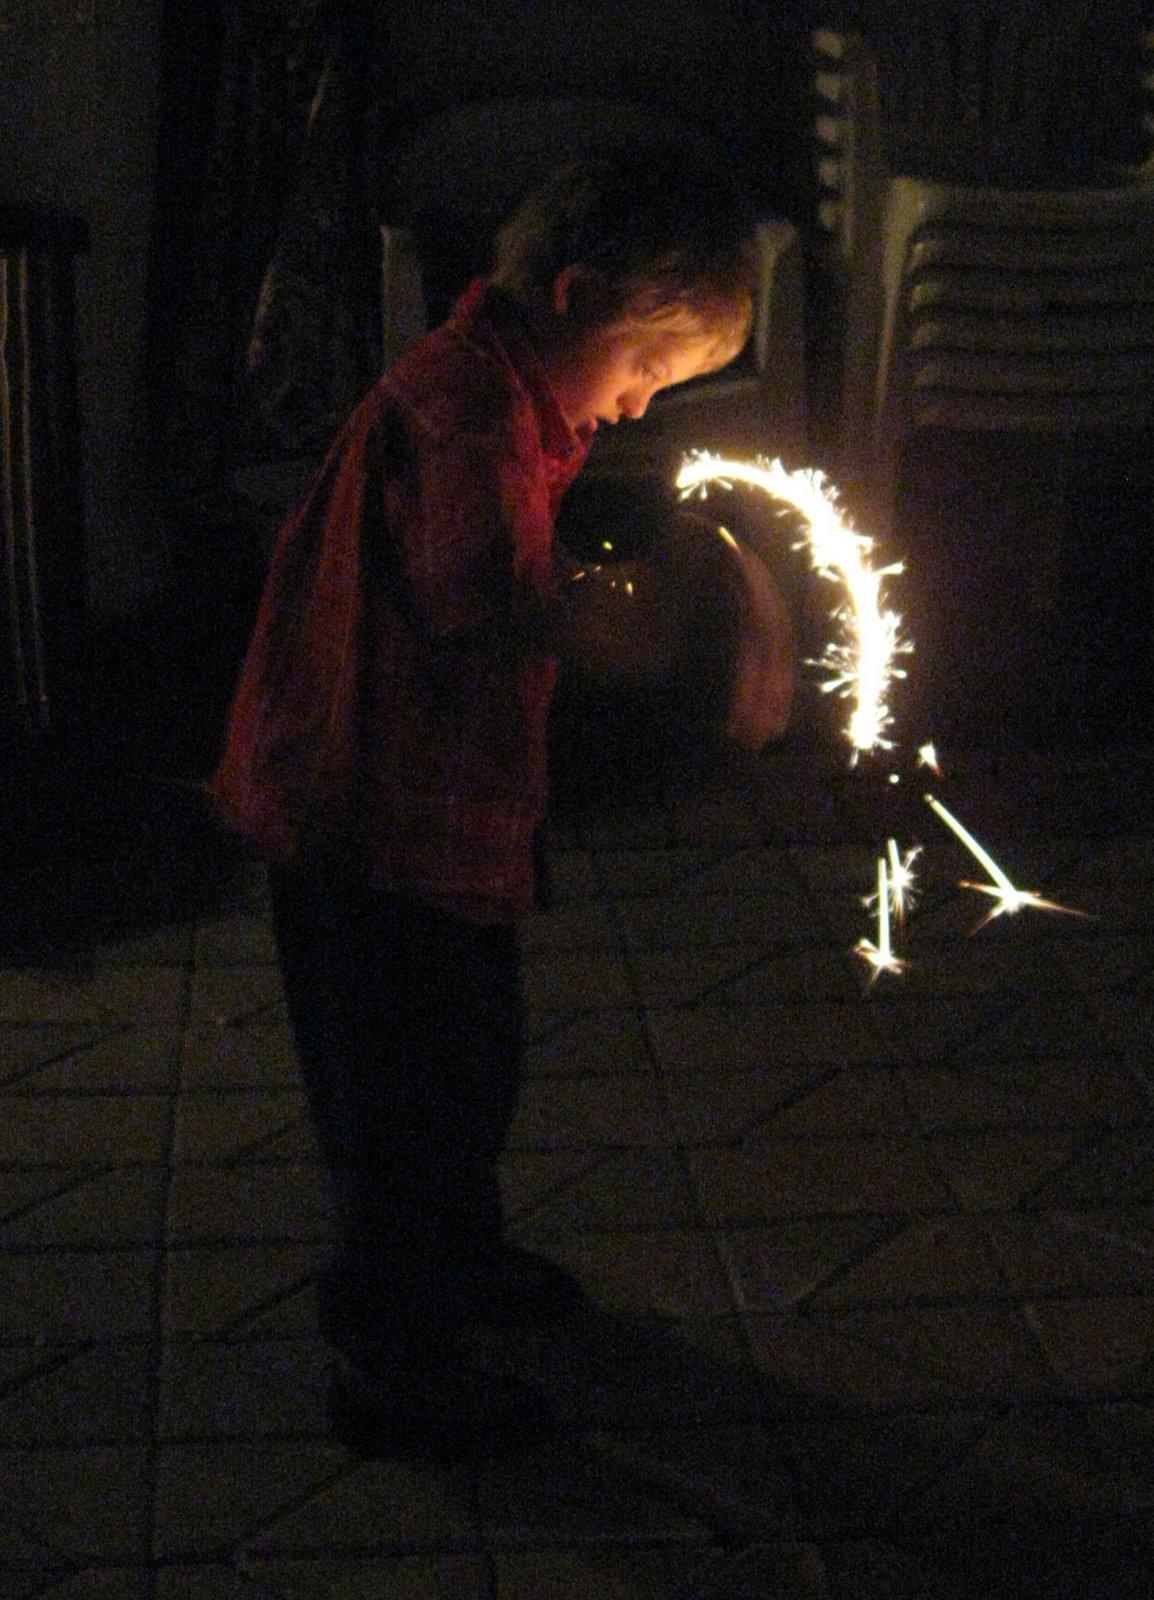 [micah+w+sparkler.jpg]